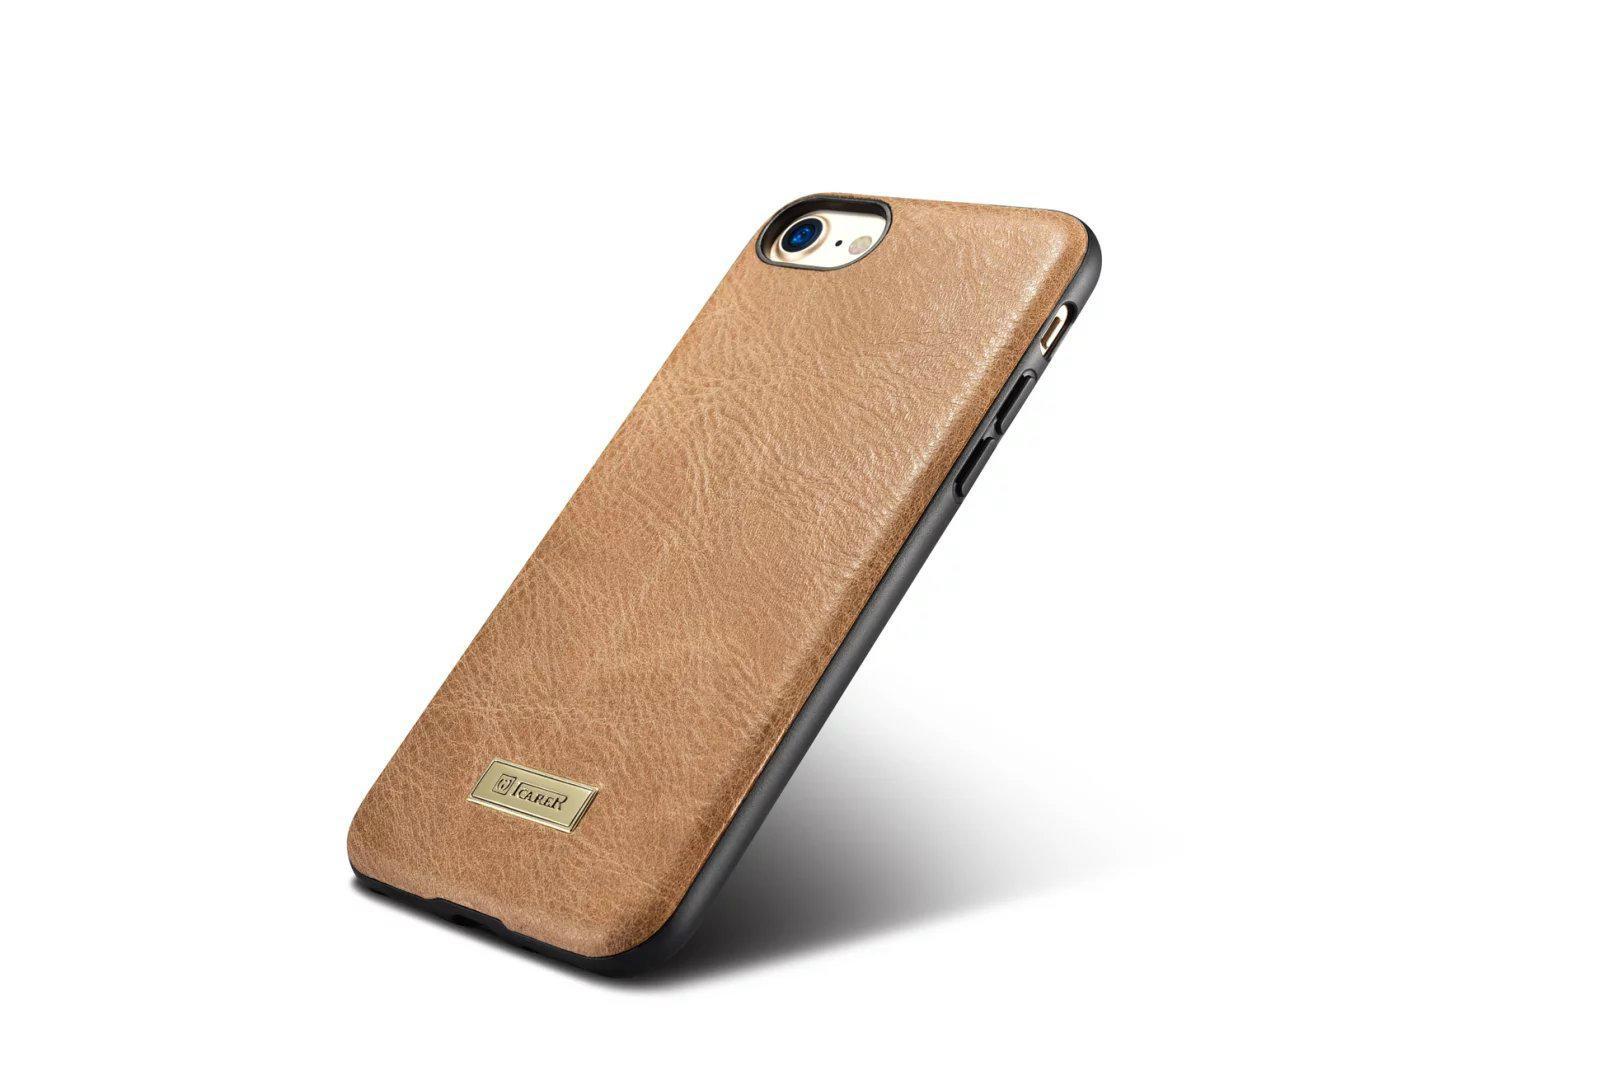 iCarer iPhone 7 Shenzhou Genuine Leather Fashional Back Cover Case 10